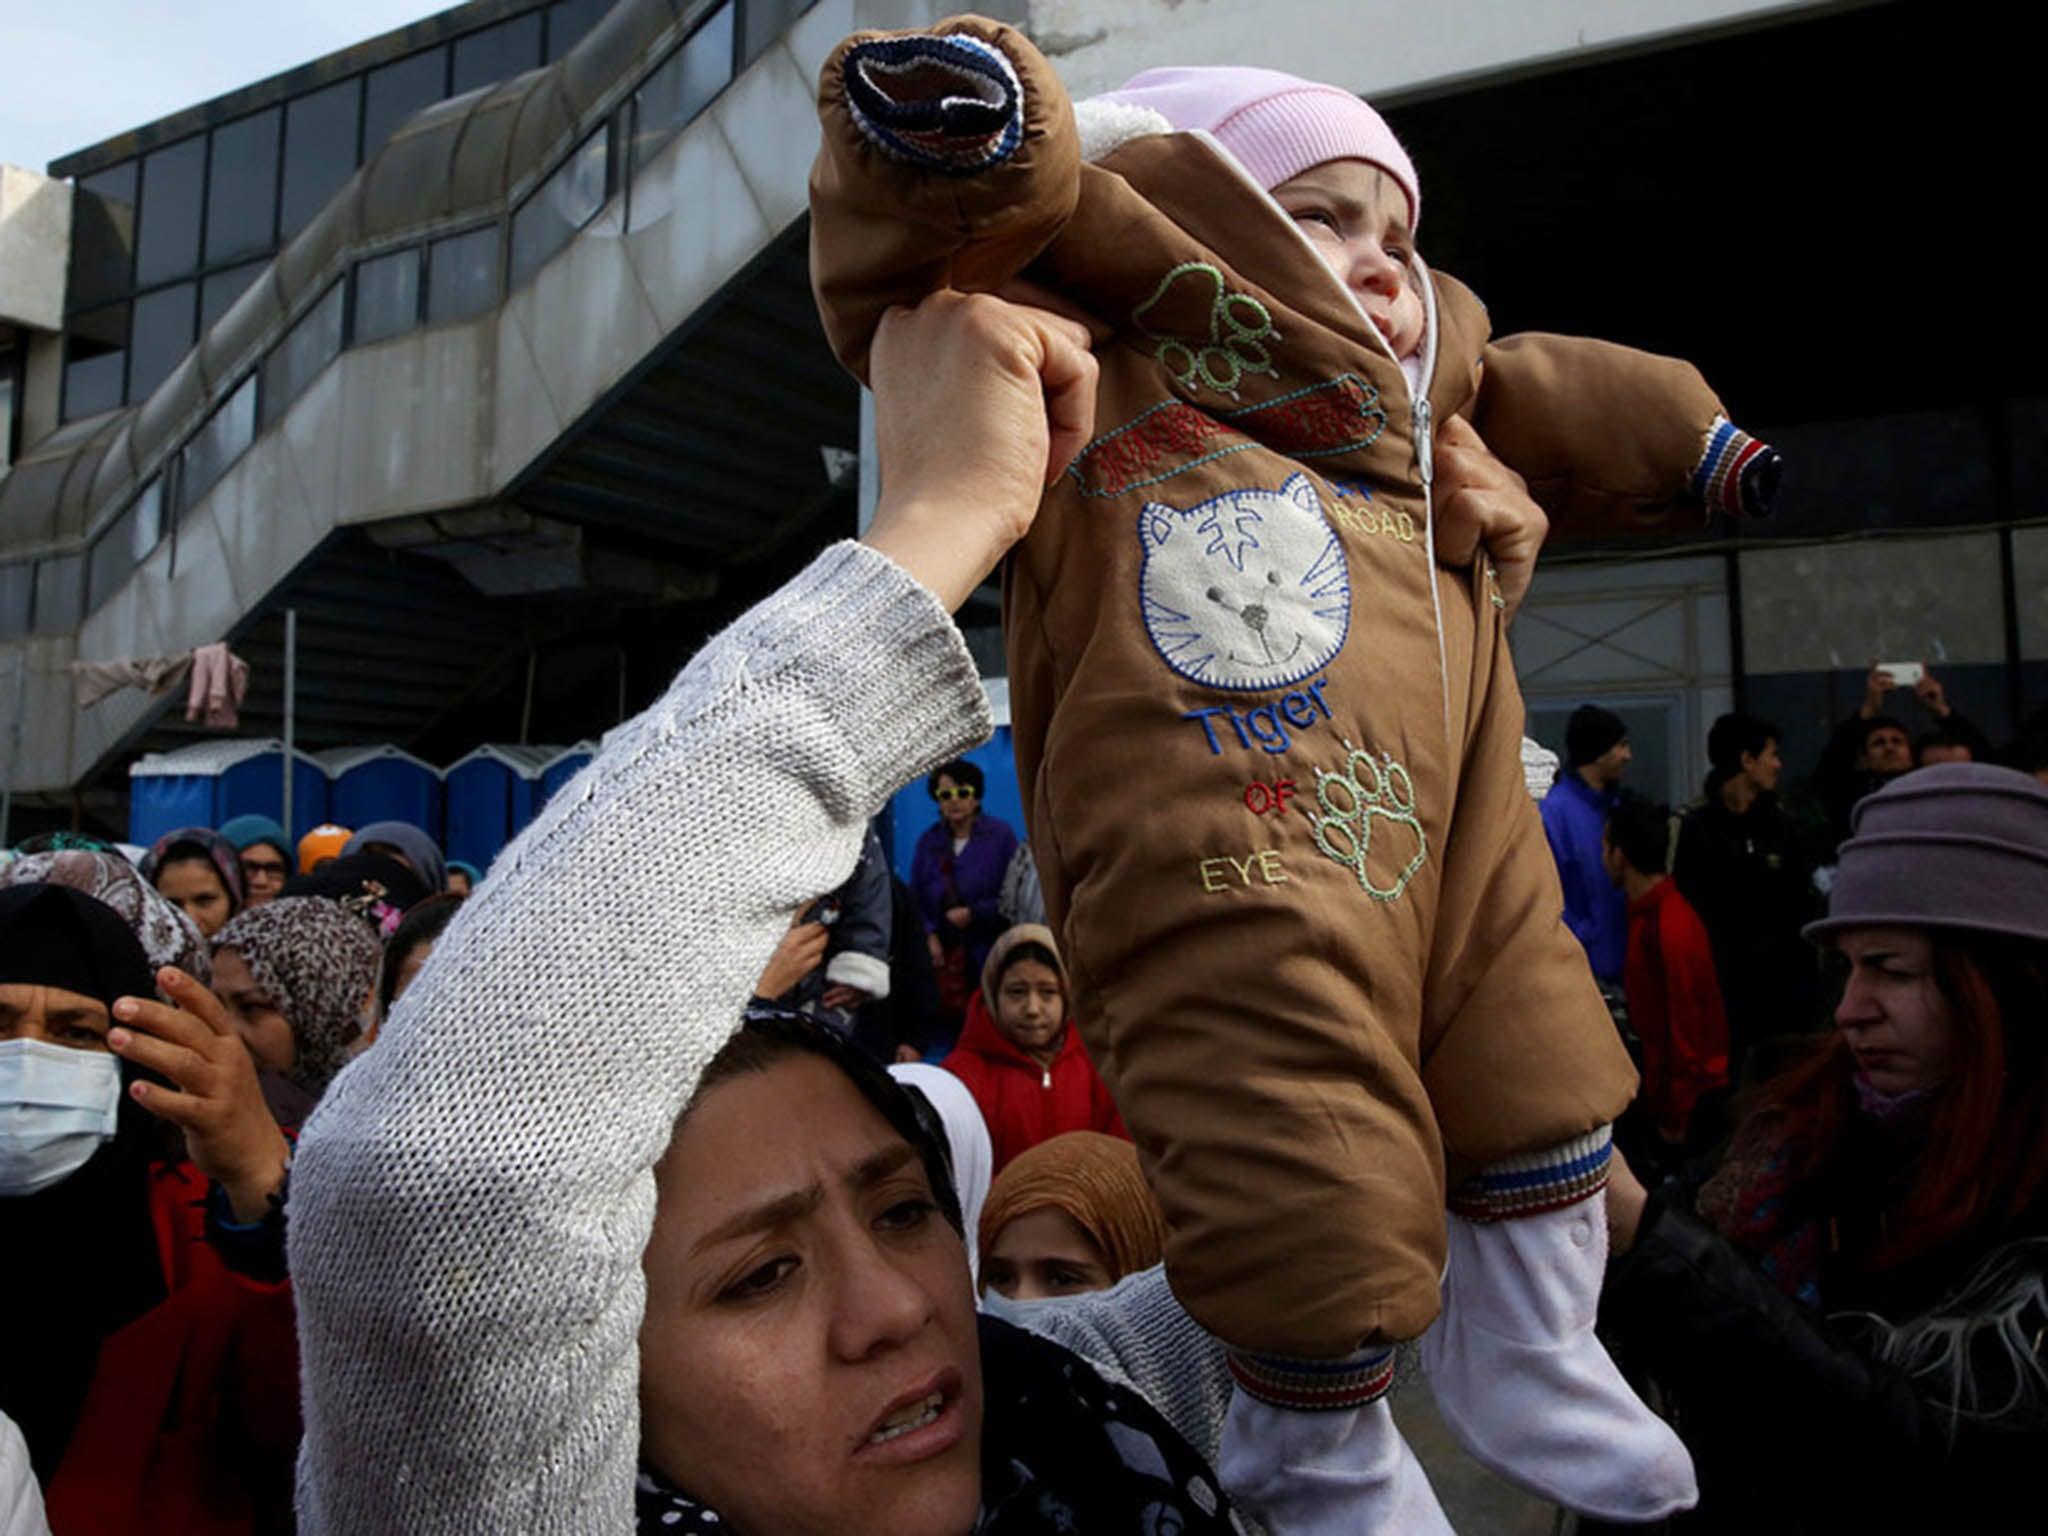 Afghan police start beating asylum seekers in front of Danish officers on deportation flight